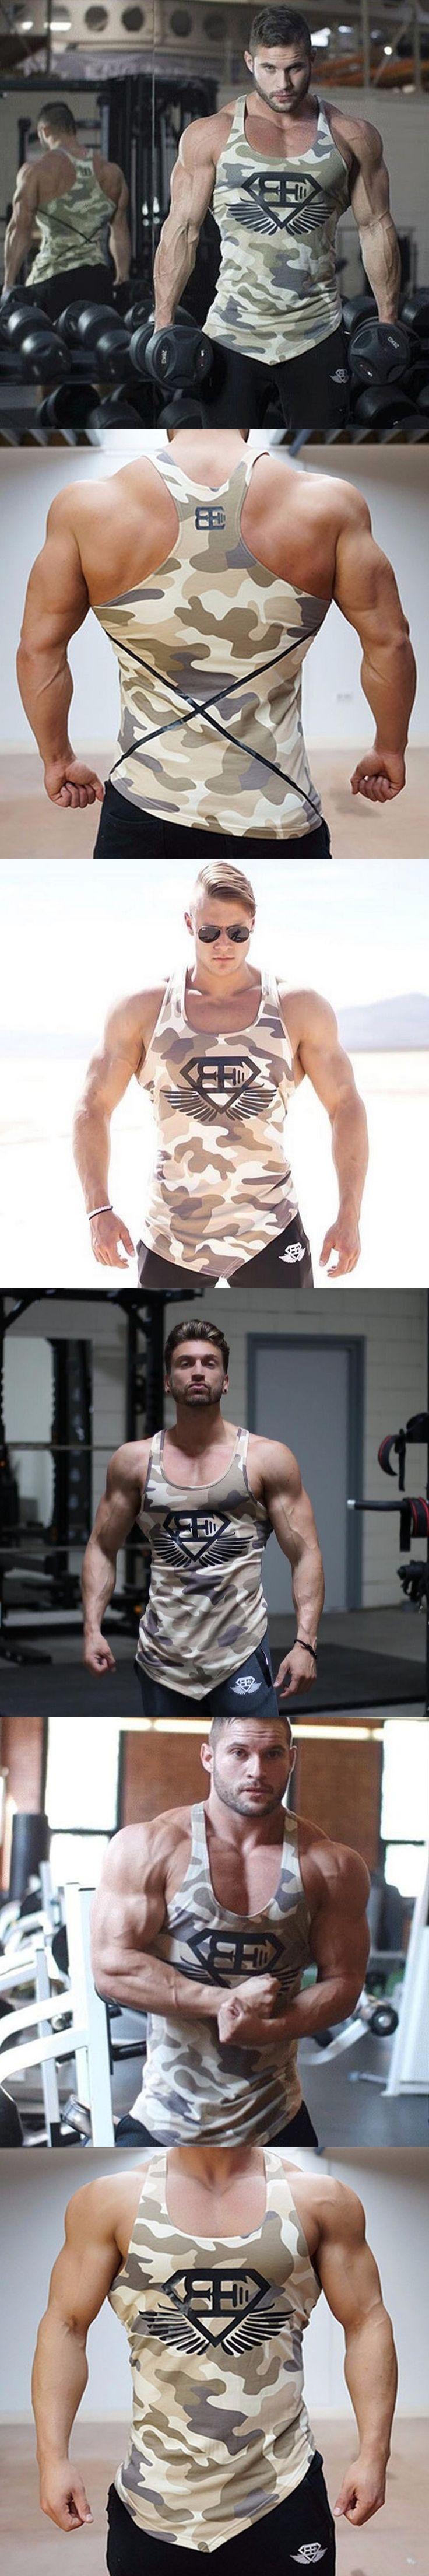 2018 Men fitness bodybuilding Tank tops gyms workout Sleeveless shirt Man Summer cool vest Casual Stringer sportswear Undershirt